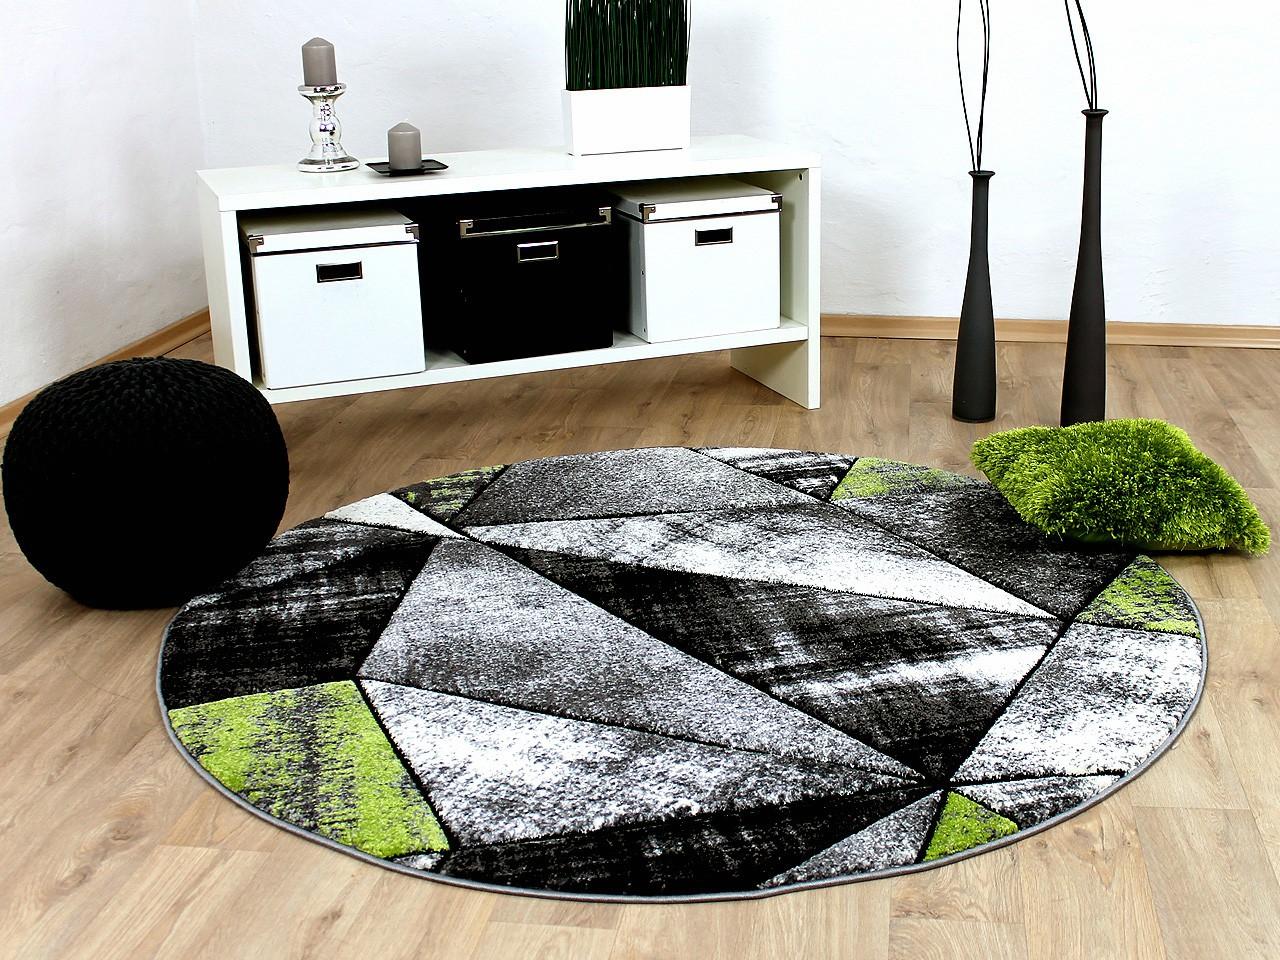 designer teppich brilliant grau gr n magic rund teppiche designerteppiche brilliant teppiche. Black Bedroom Furniture Sets. Home Design Ideas